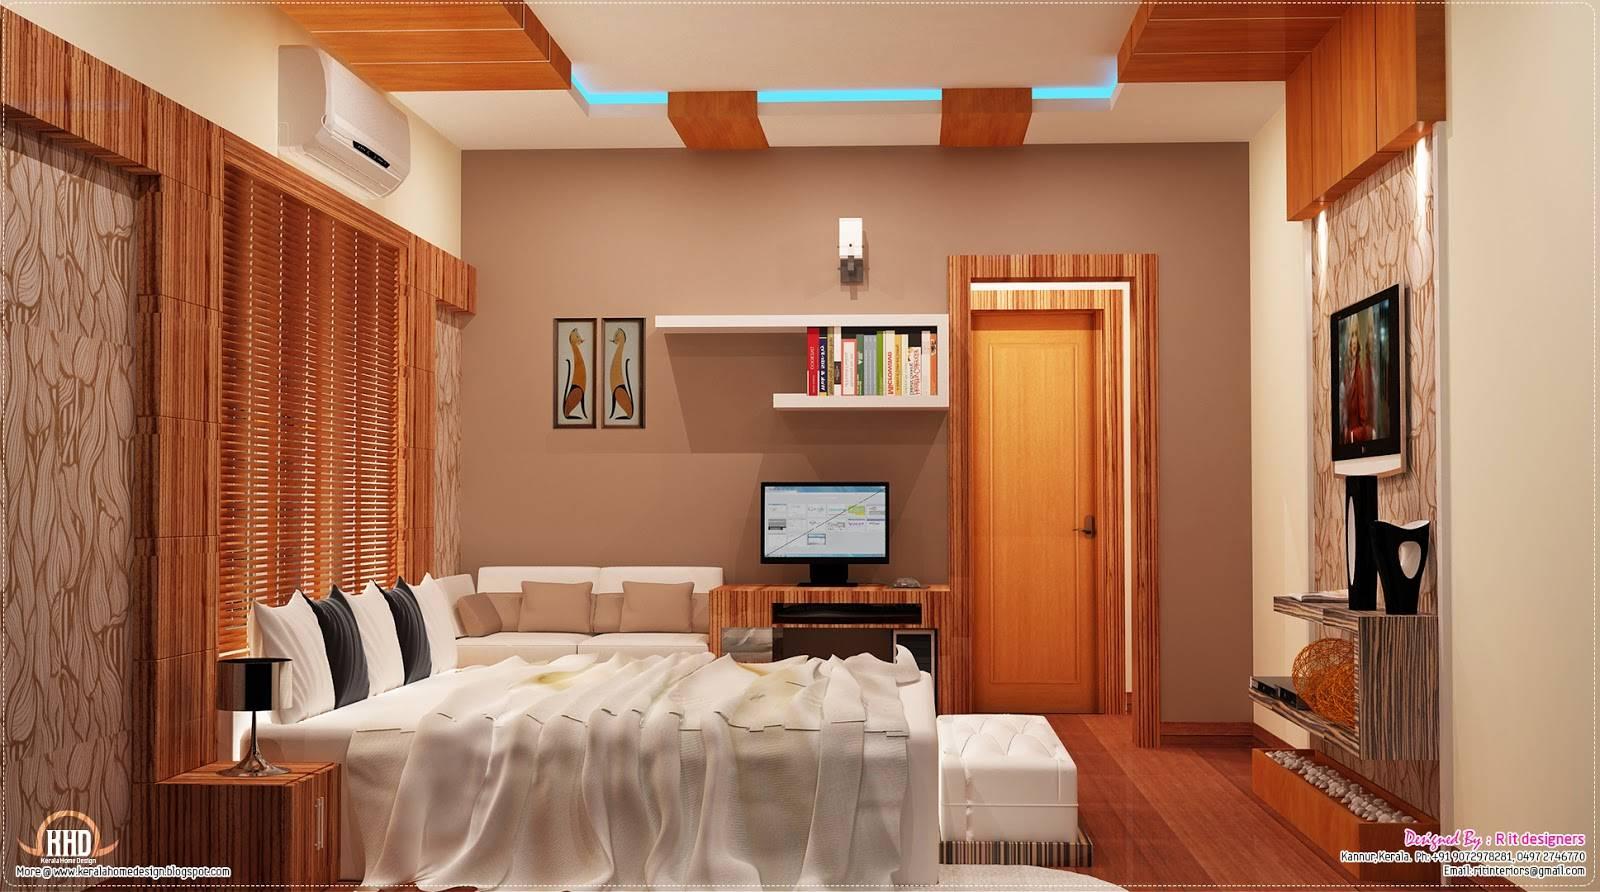 Feet Kerala Home Interior Designs House Design Plans House Plans 48307